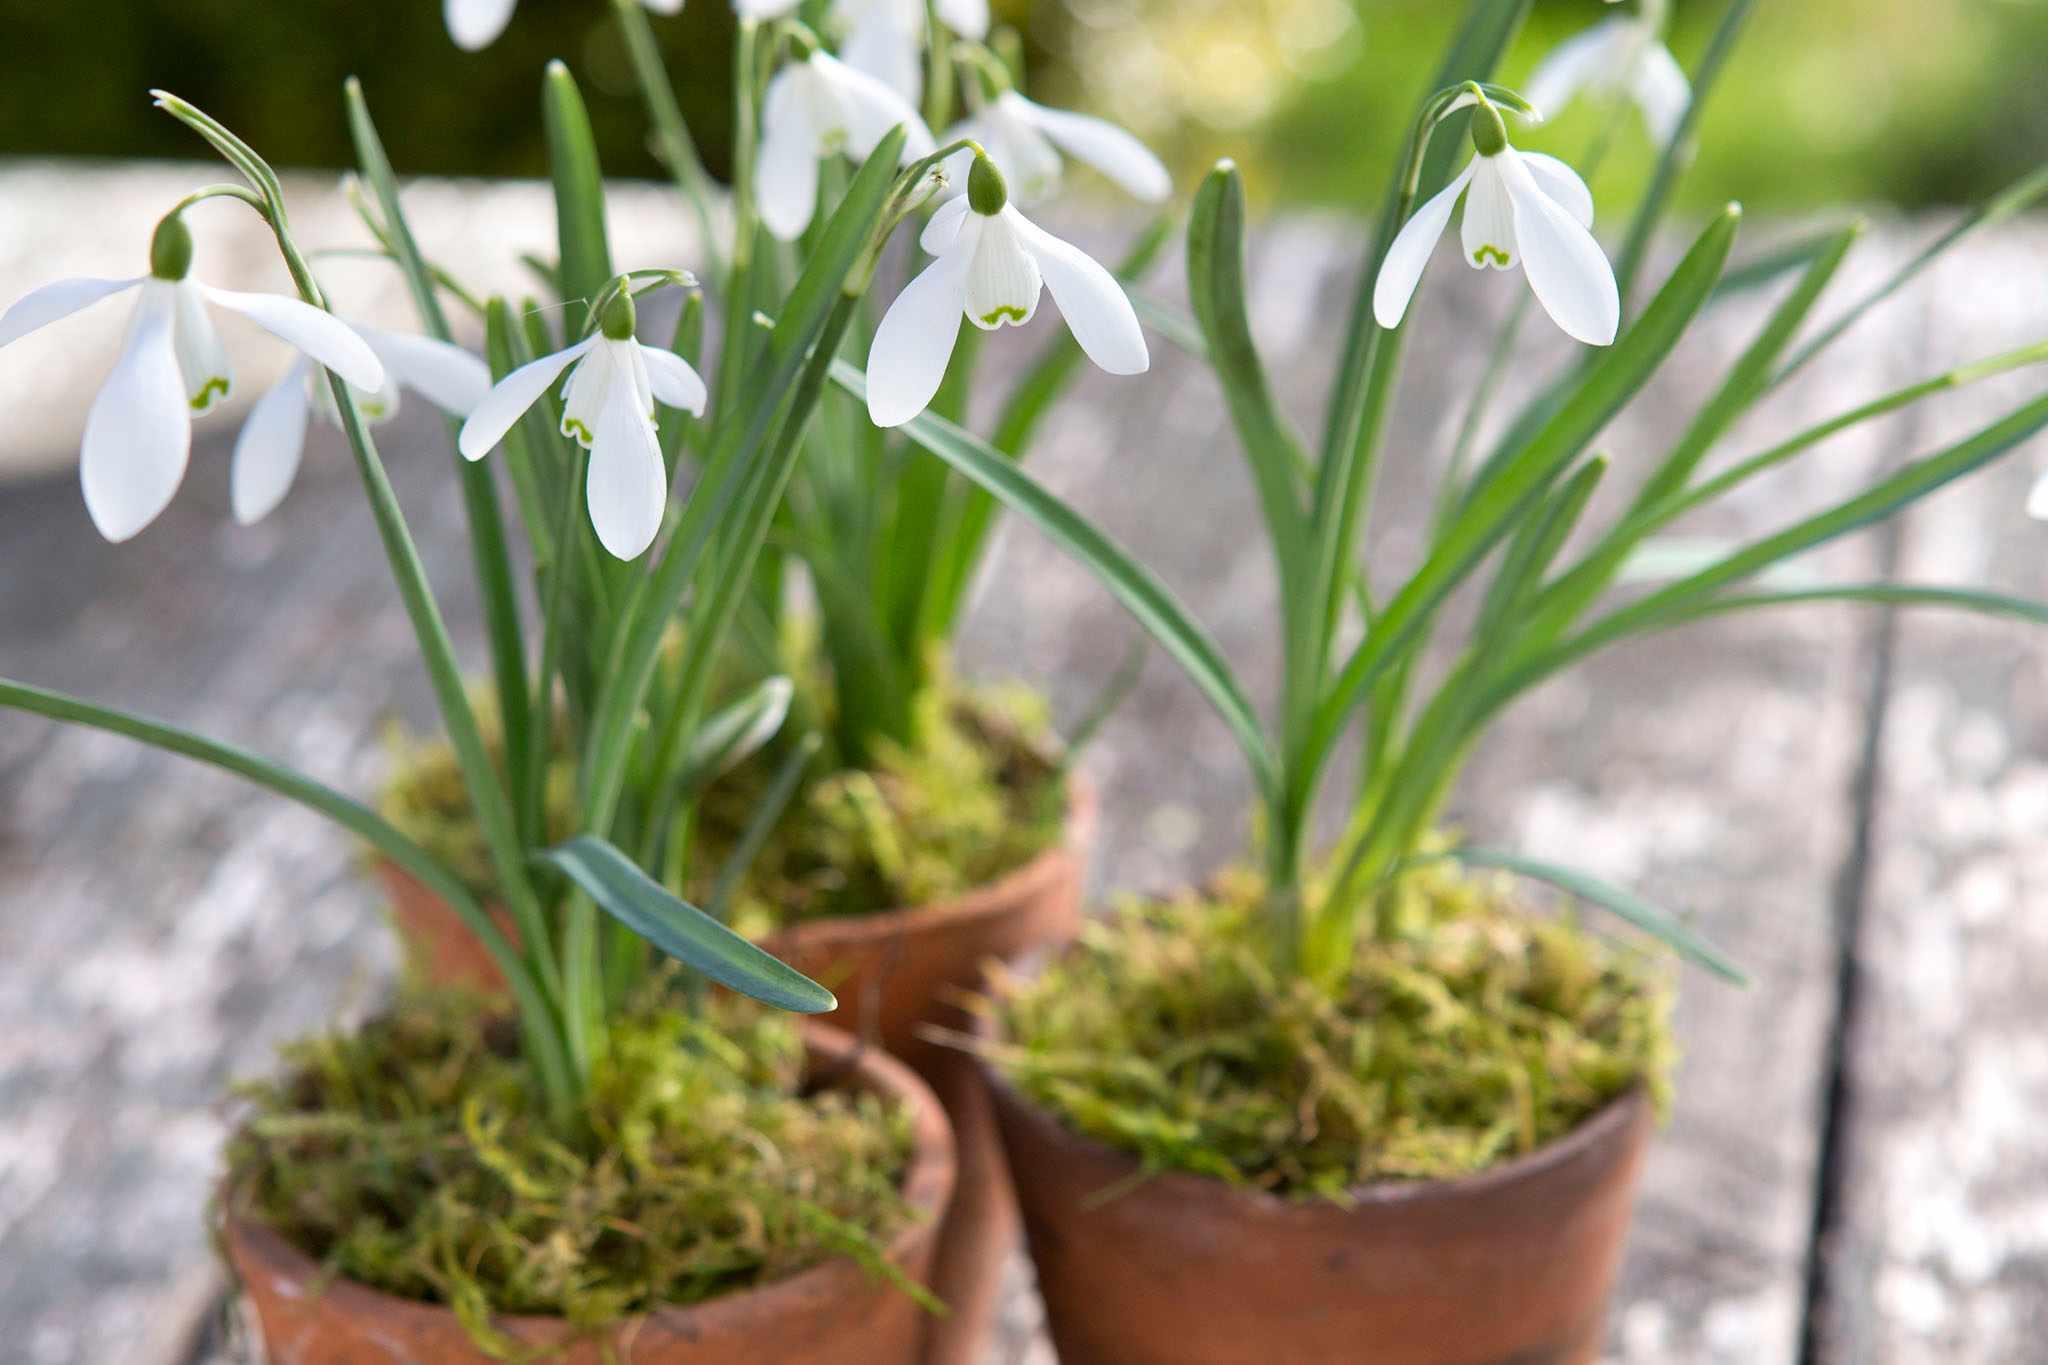 Snowdrops in pots